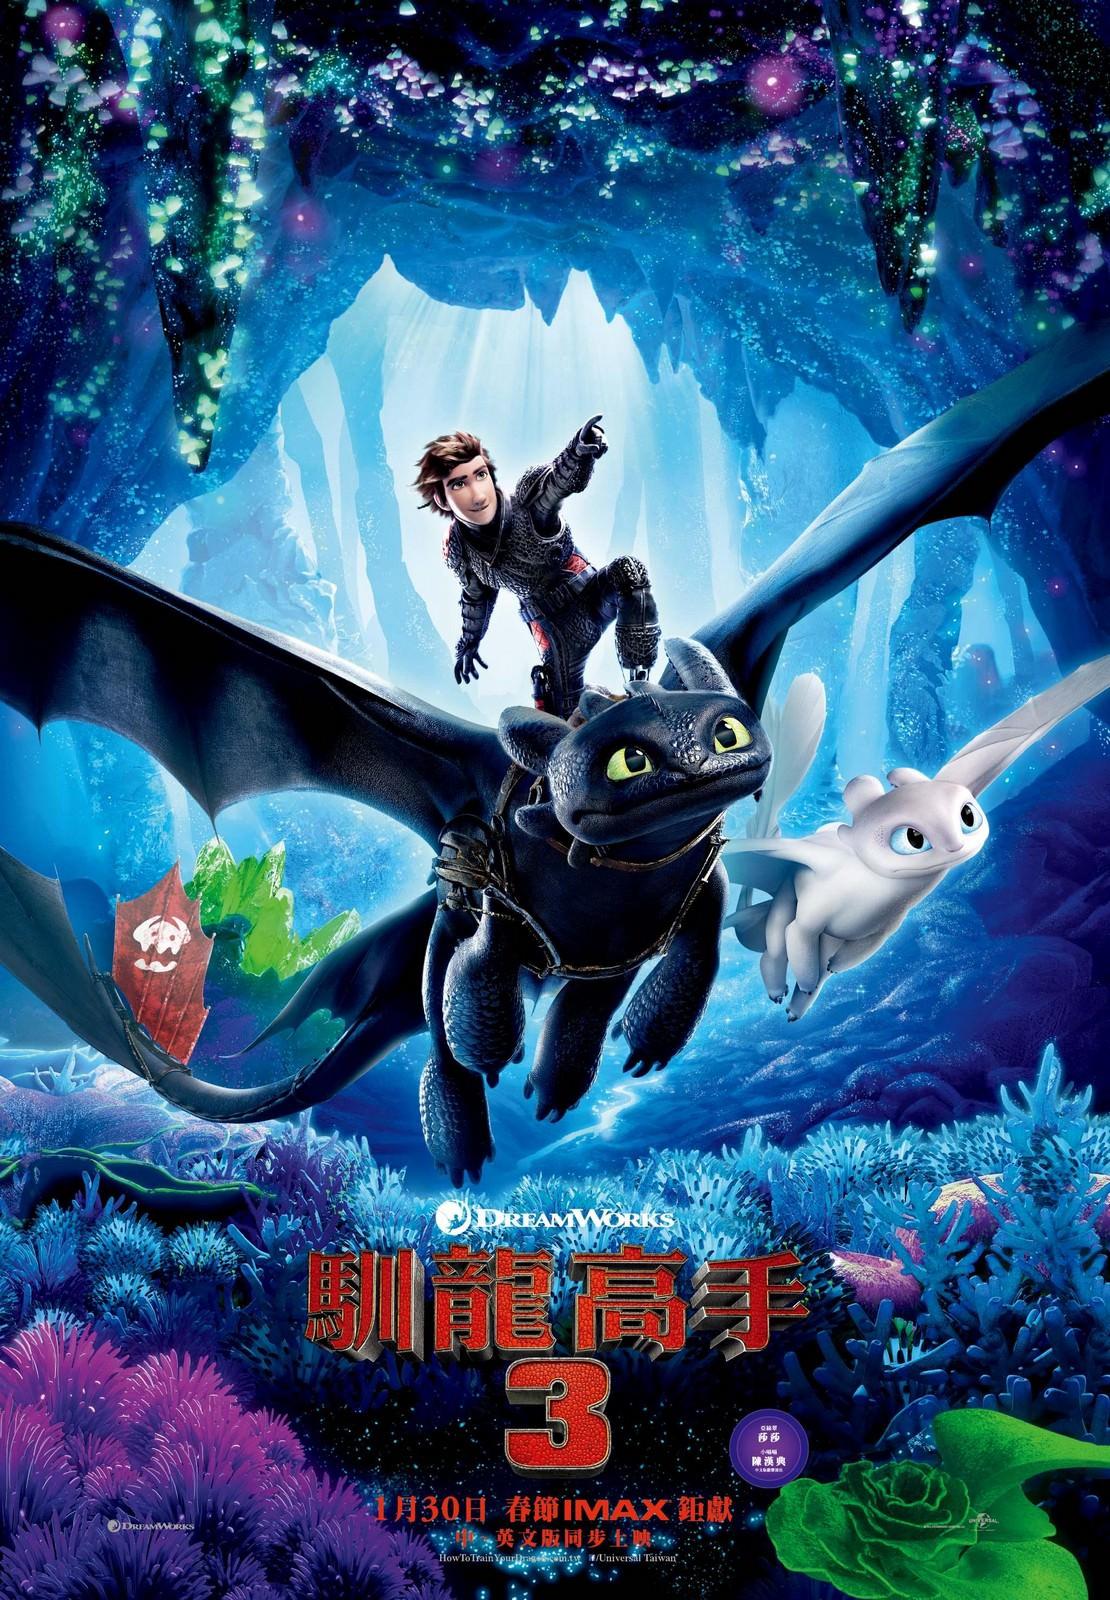 Movie, How to Train Your Dragon: The Hidden World(美國, 2019年) / 馴龍高手3(台灣) /馴龍記3(香港) / 驯龙高手3(中國), 電影海報, 台灣